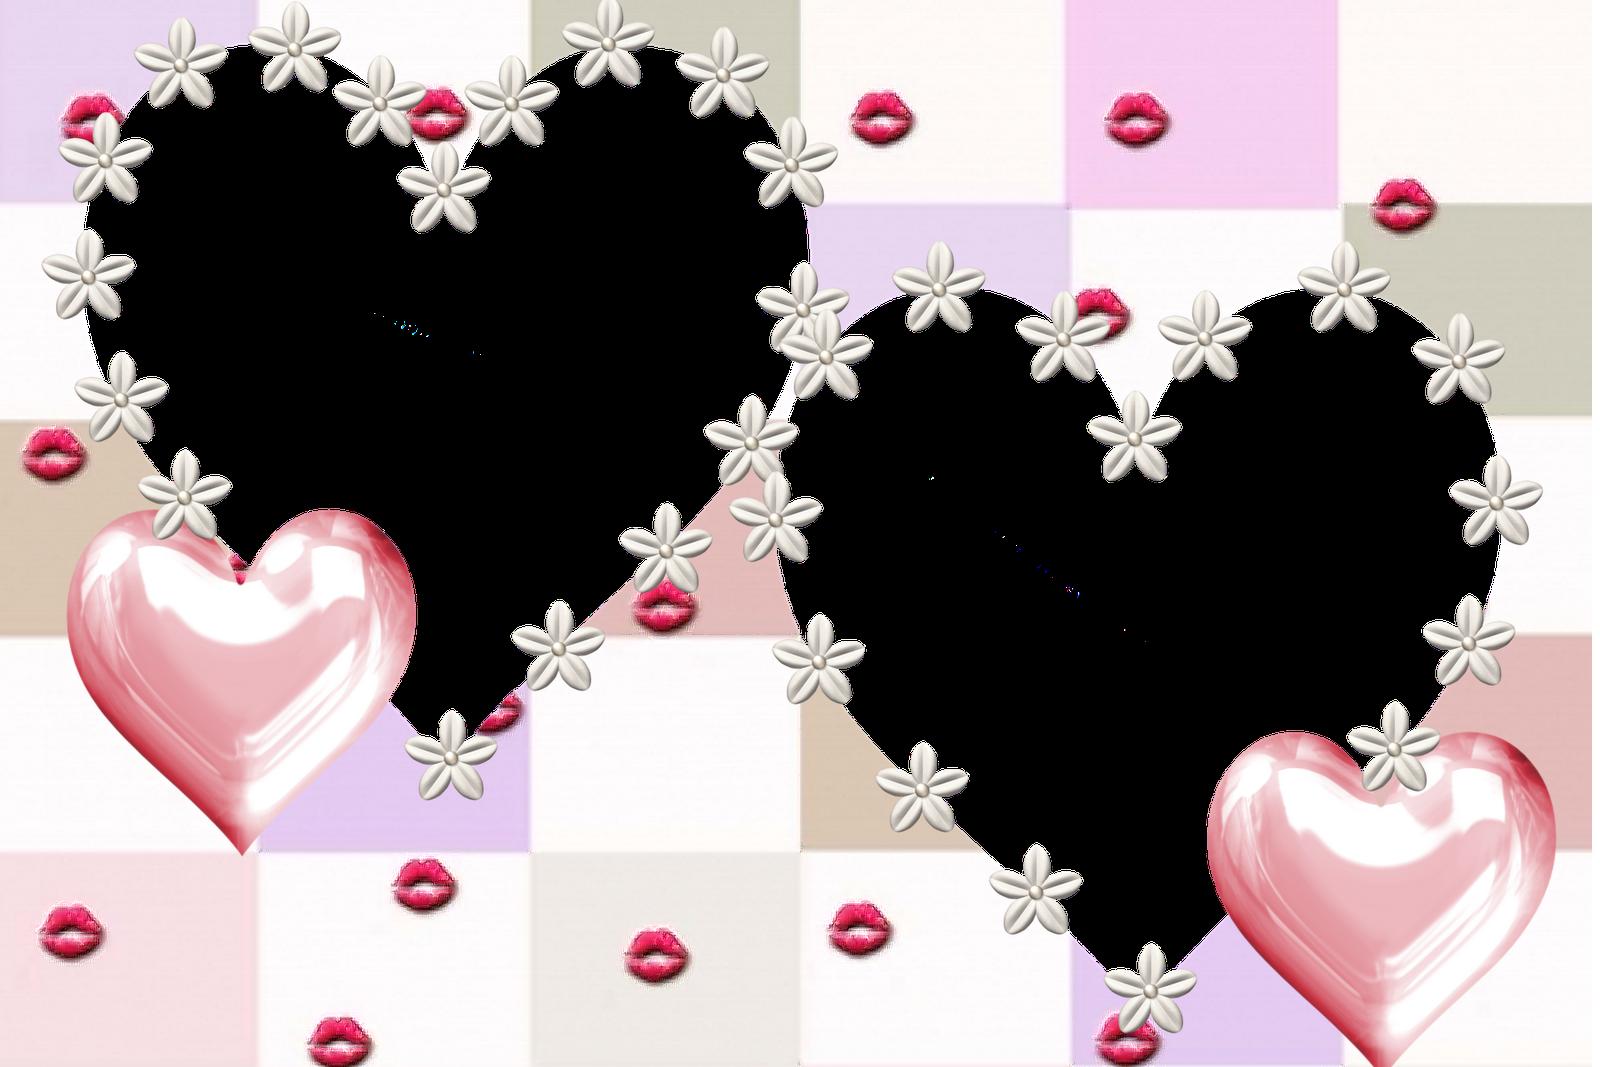 Love Frame Png Transparent Images 1293: 16 Photoshop Borders And Frames Love Images